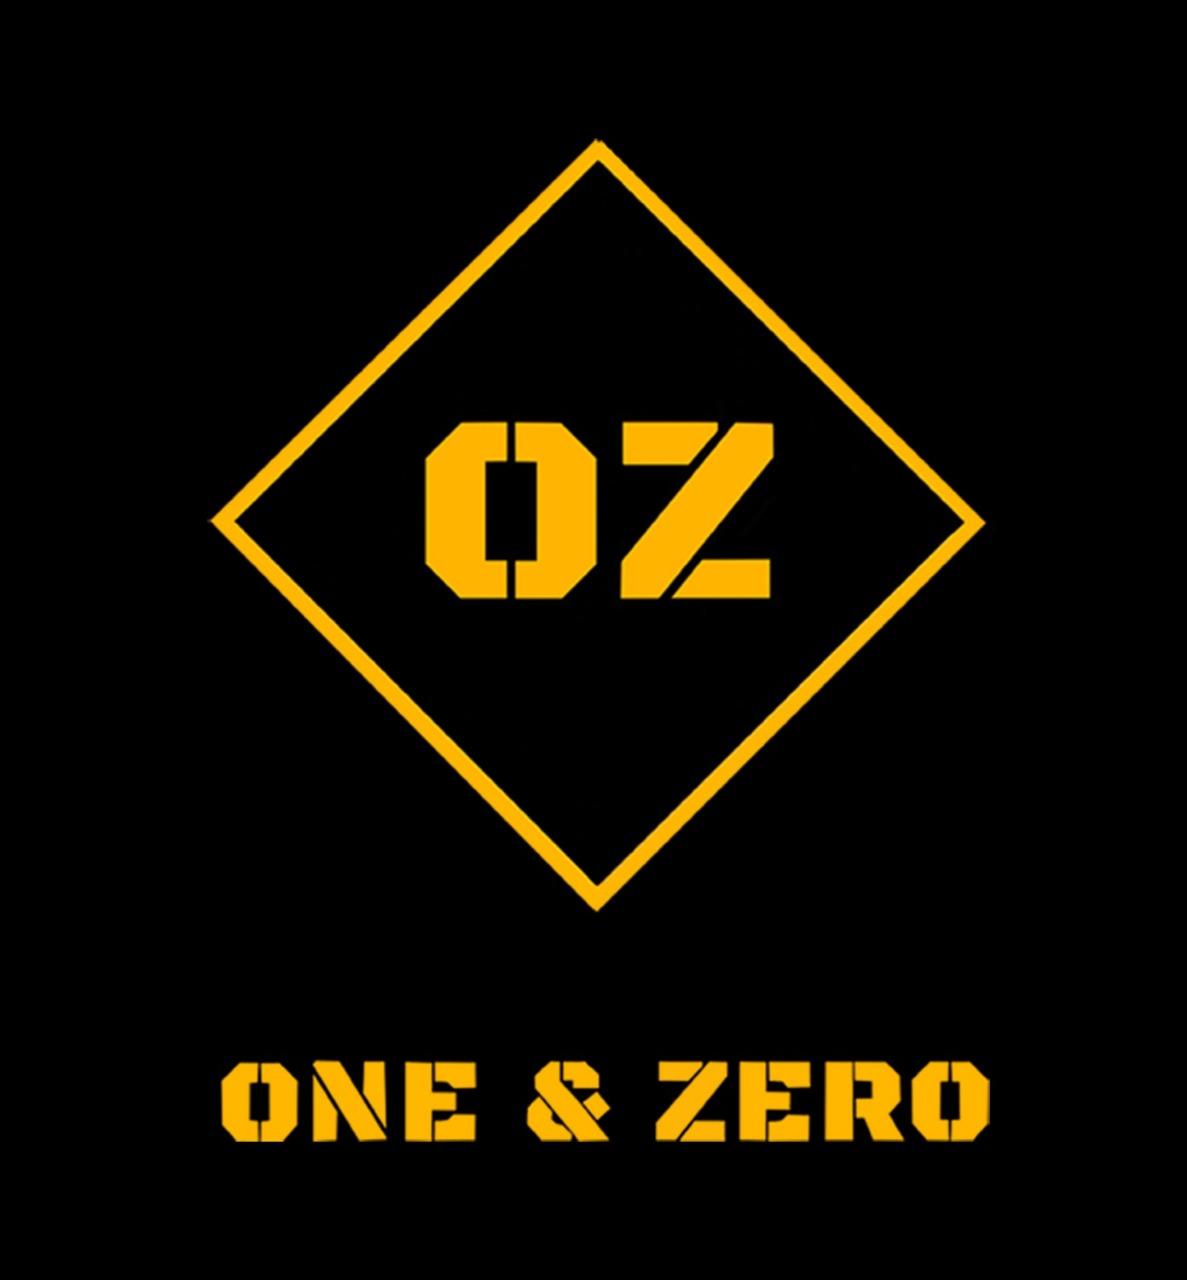 One & Zero The Marketing Trend